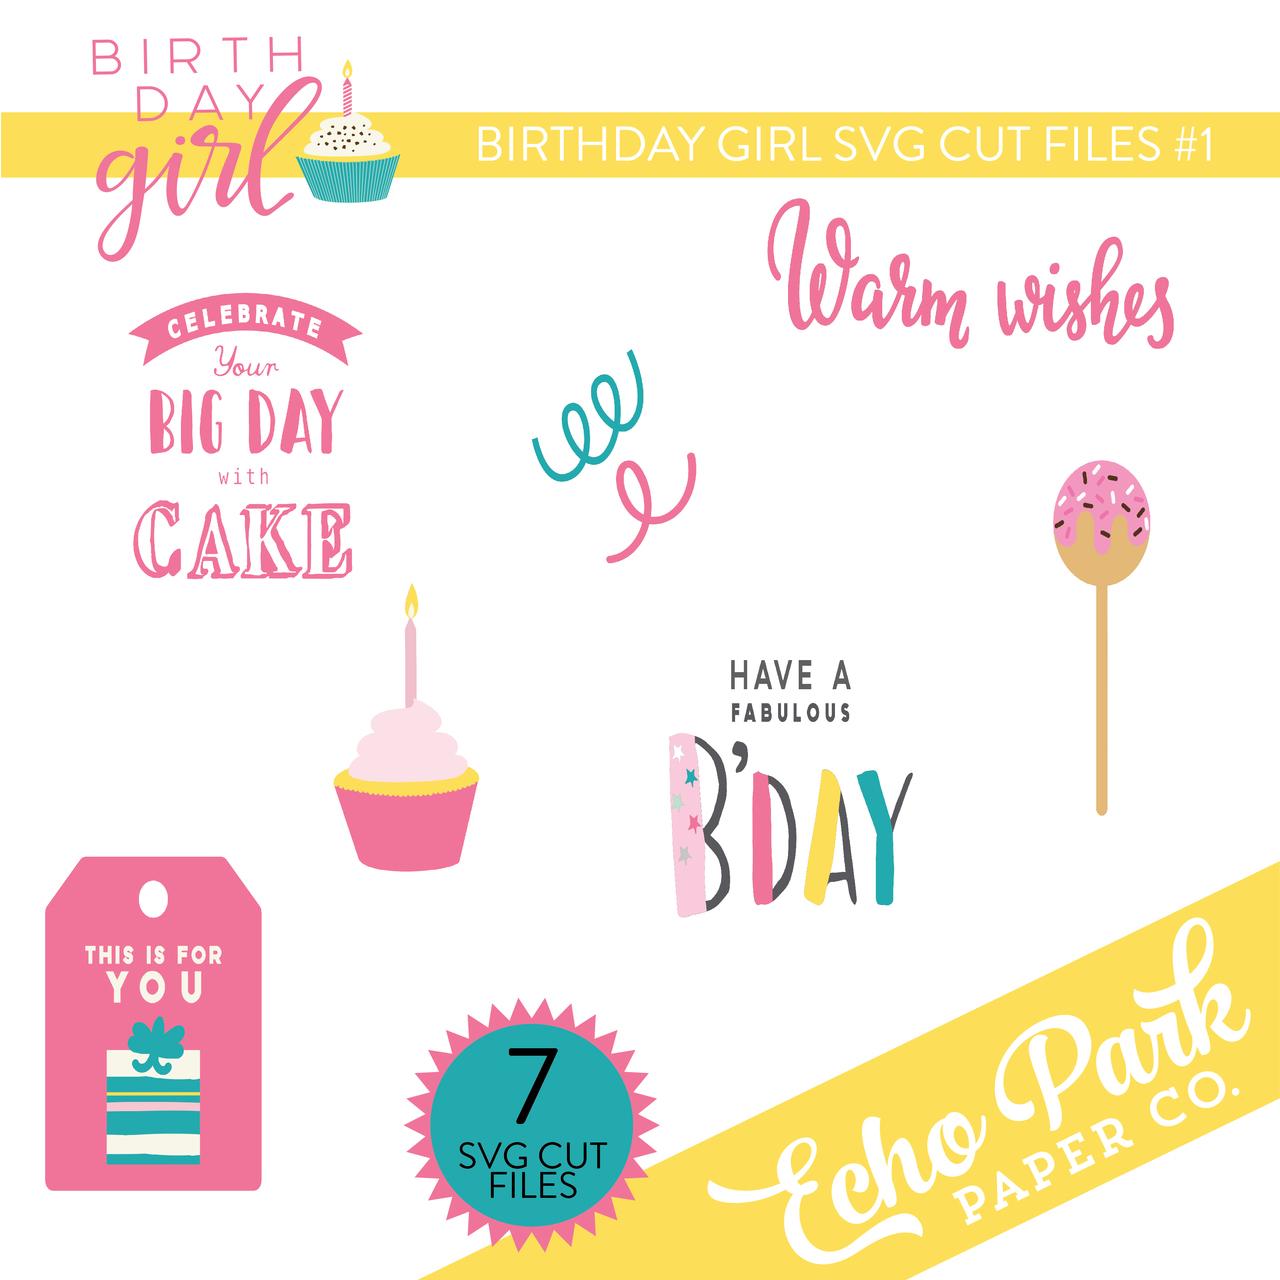 Birthday Girl SVG Cut Files #1